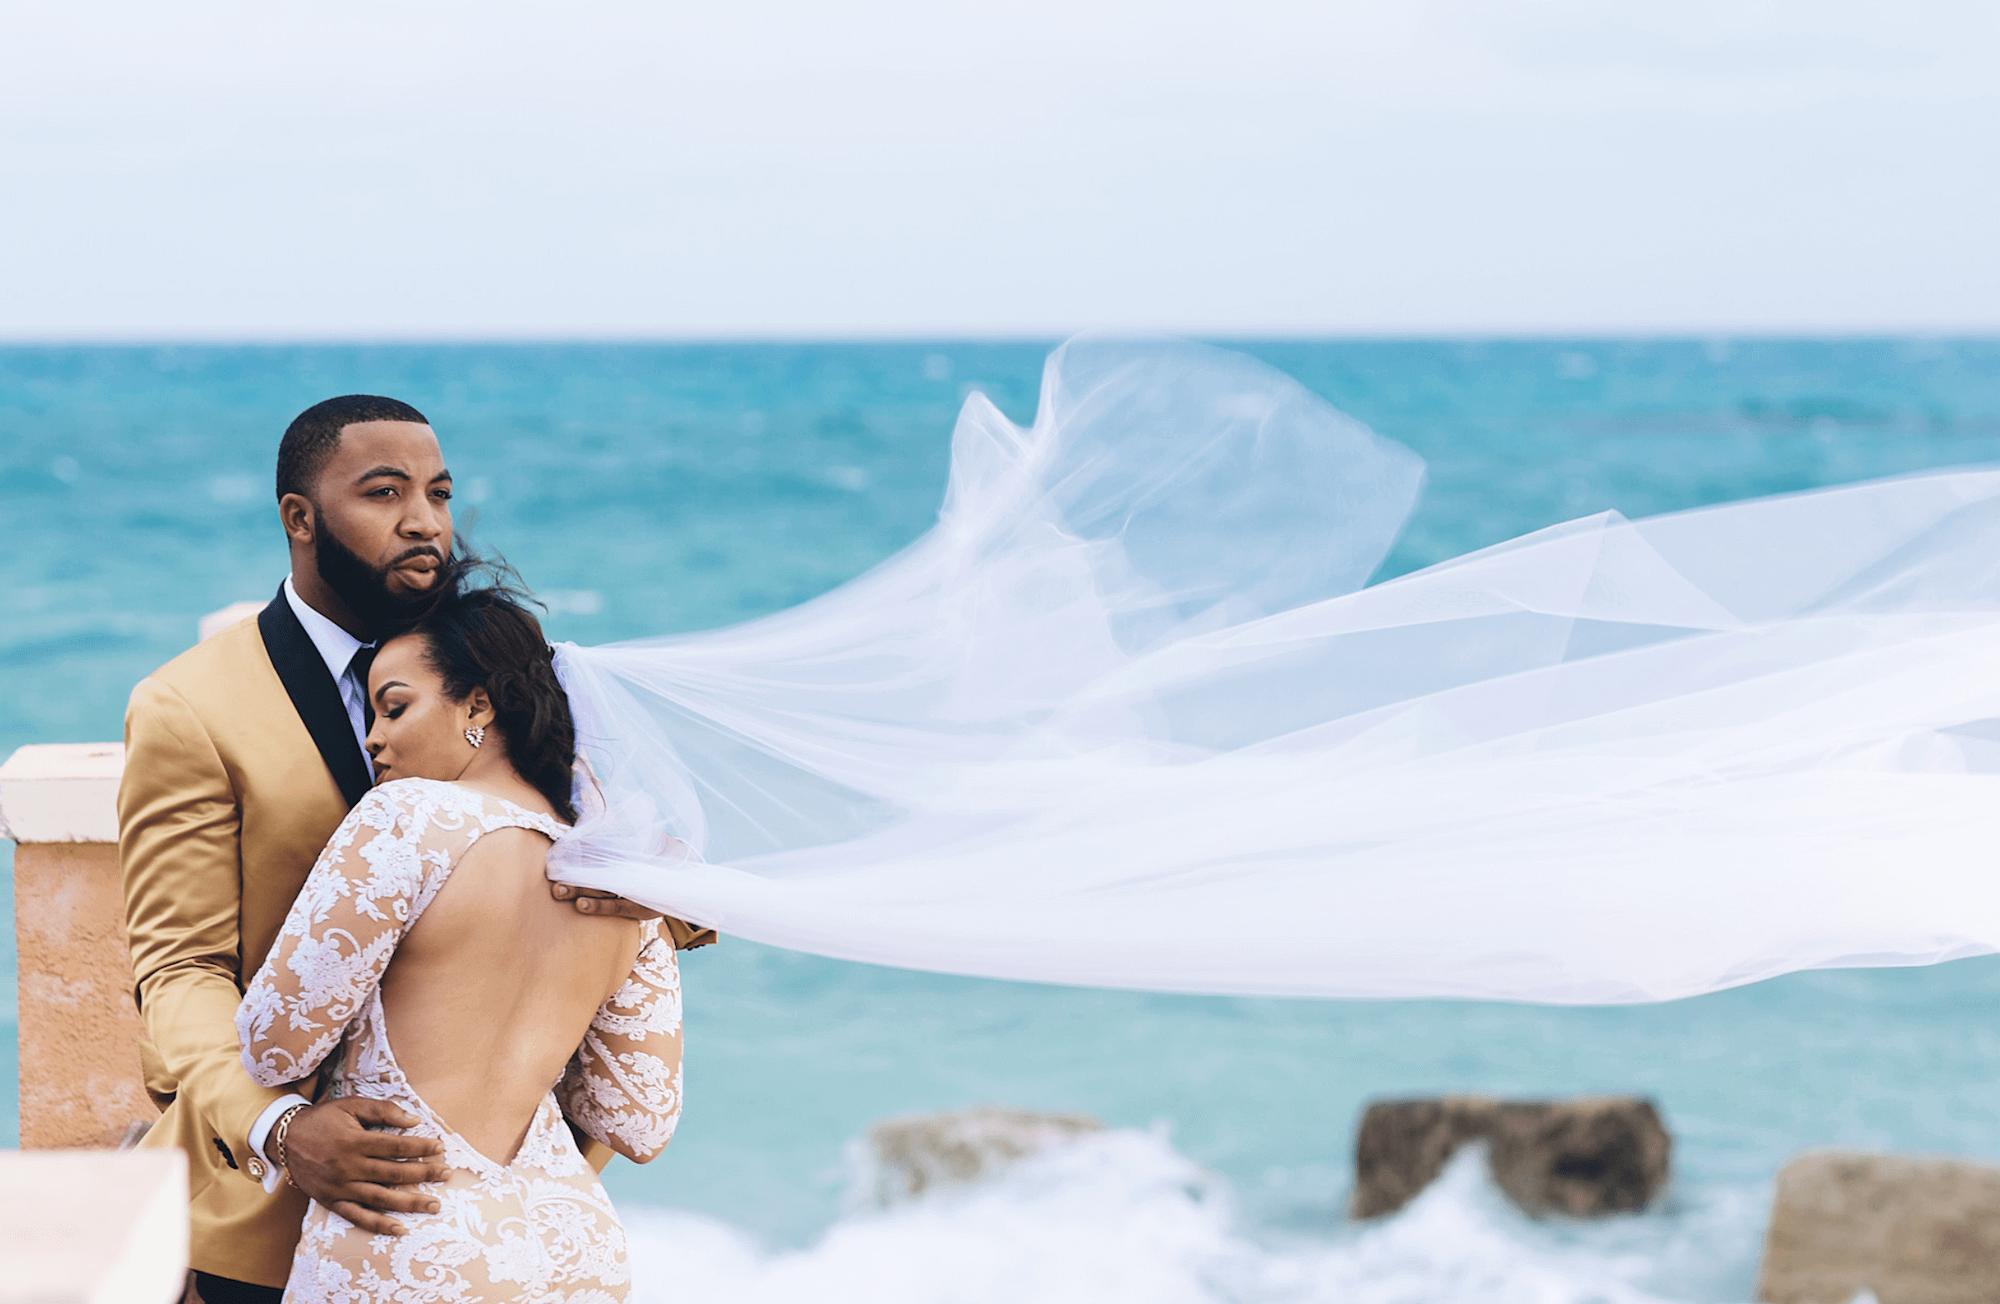 desti-guide-to-destination-weddings-podcast-008-bahamas-destination-wedding-photographer-black-destination-bride-stanlo-photography-interview-1.png